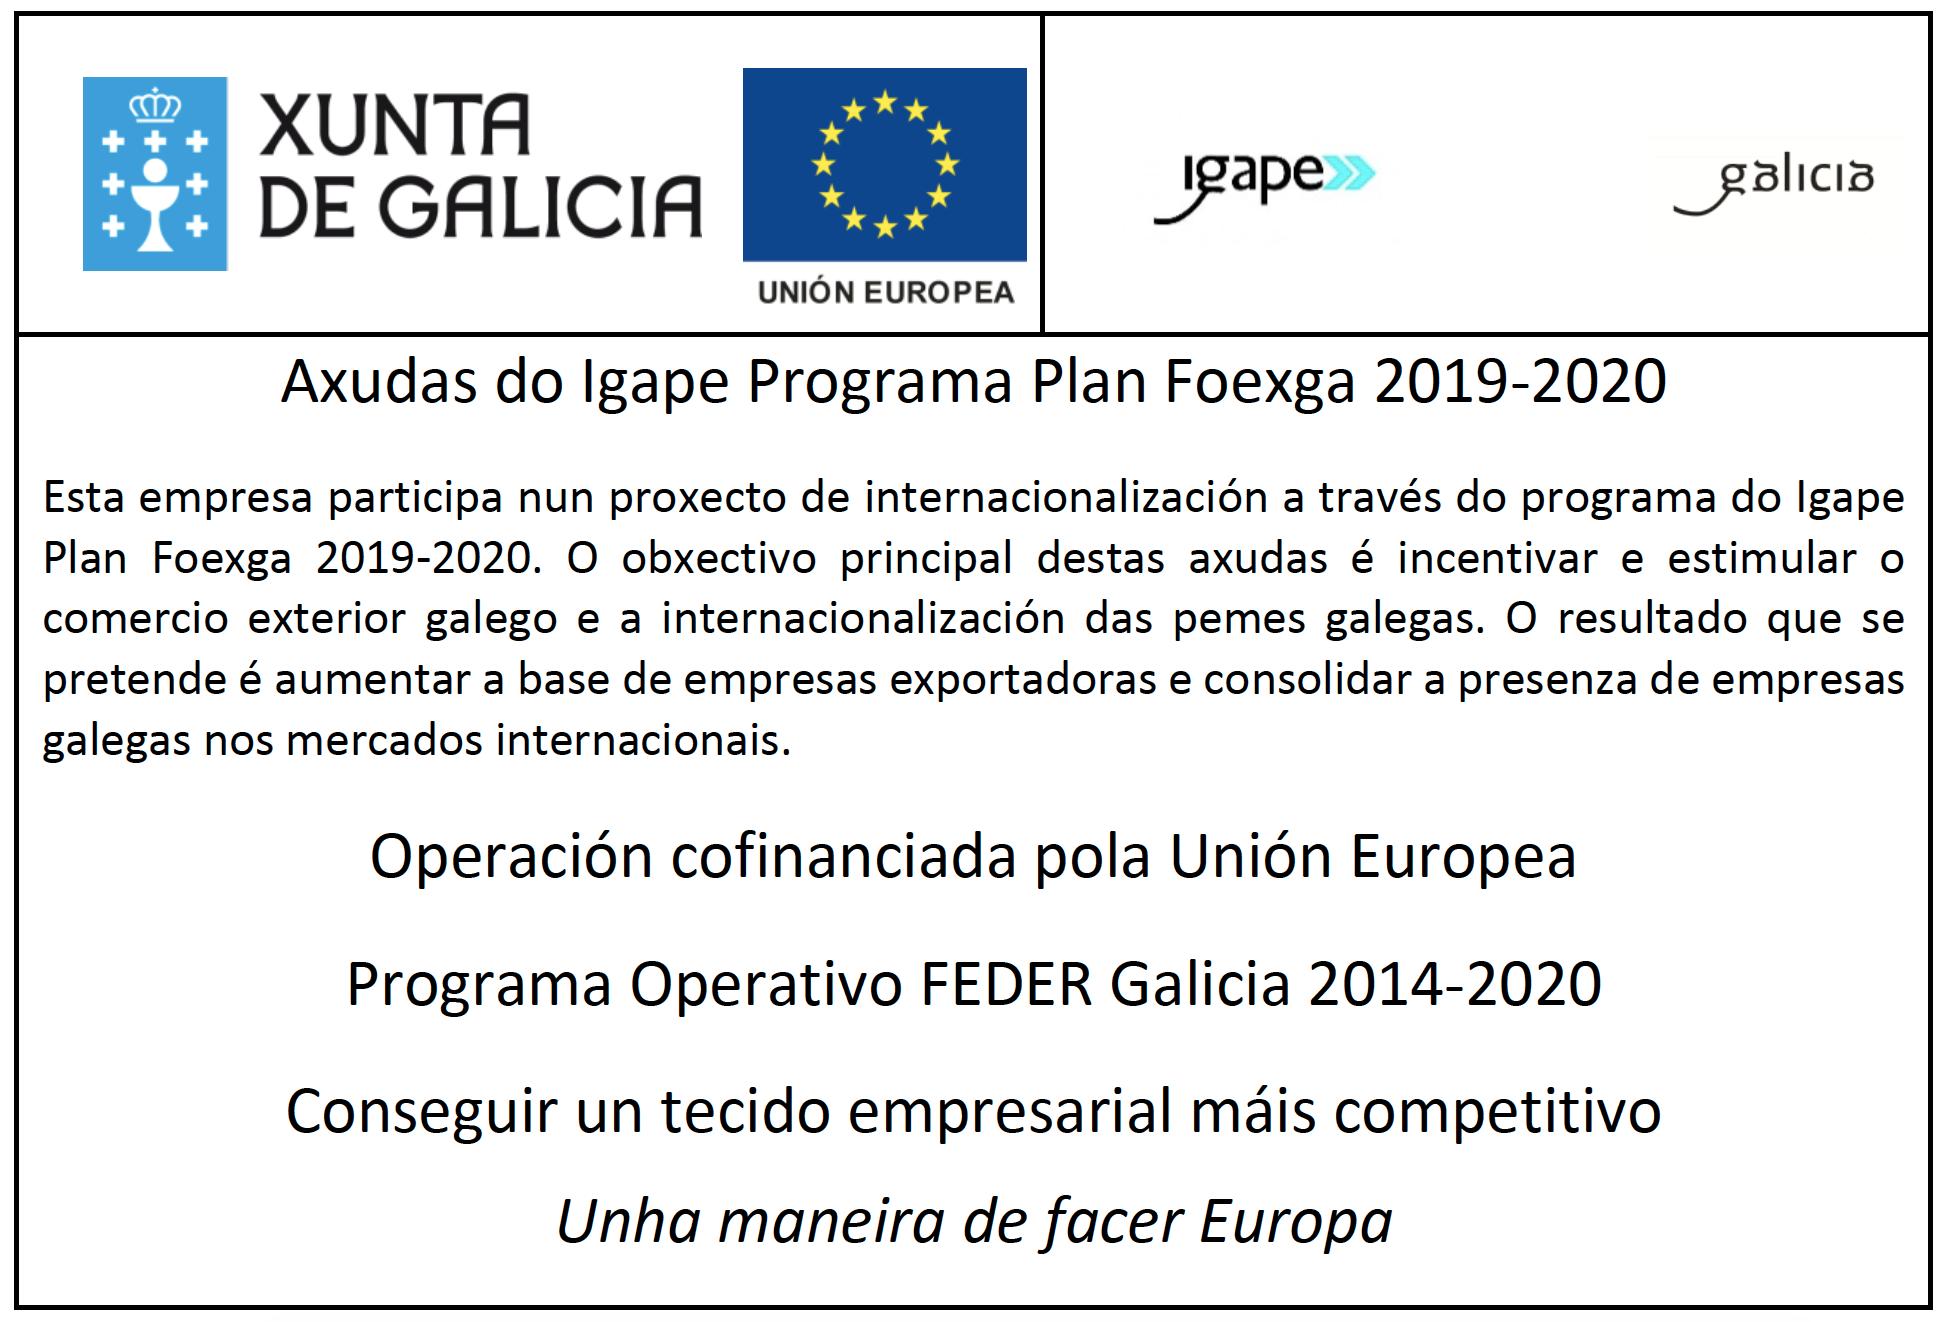 Plan Foexga 2019-2020